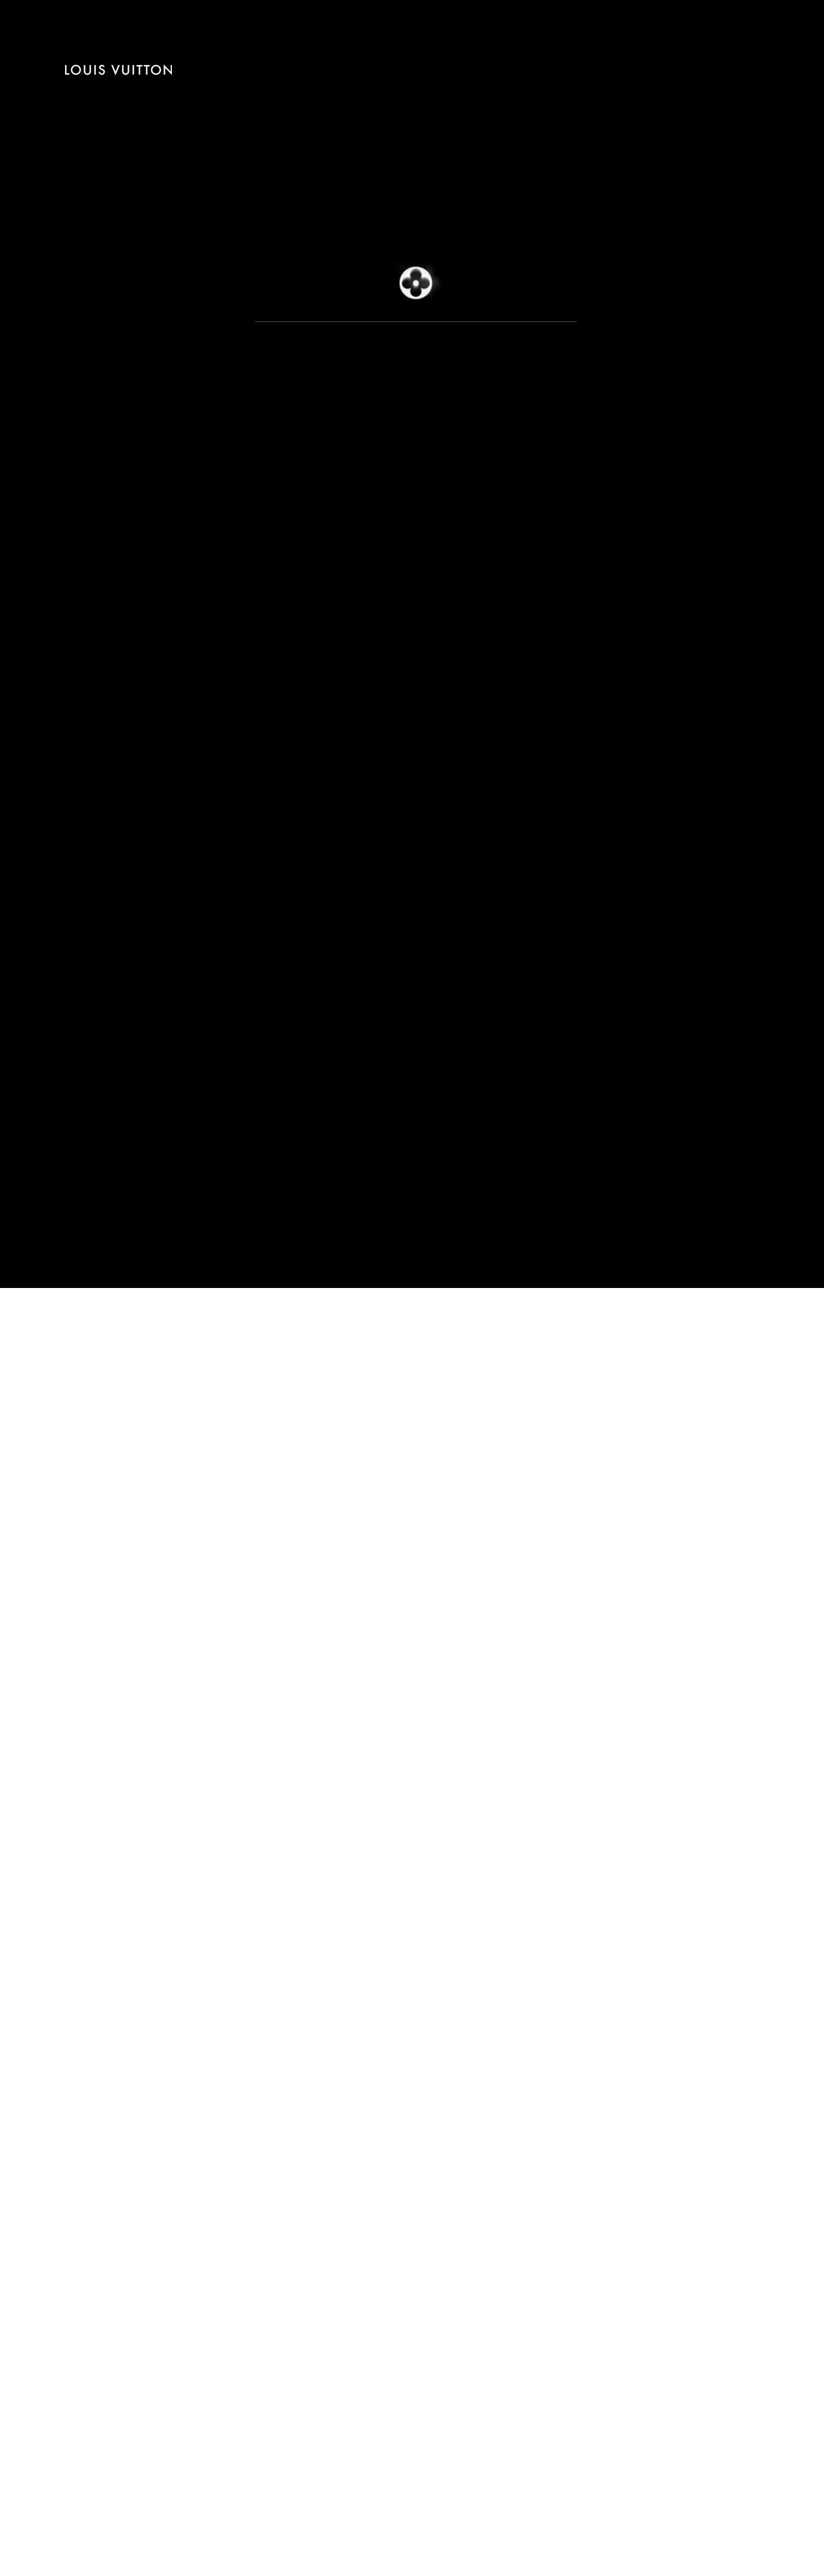 LOUISVUITTON.COM - Louis Vuitton International Page